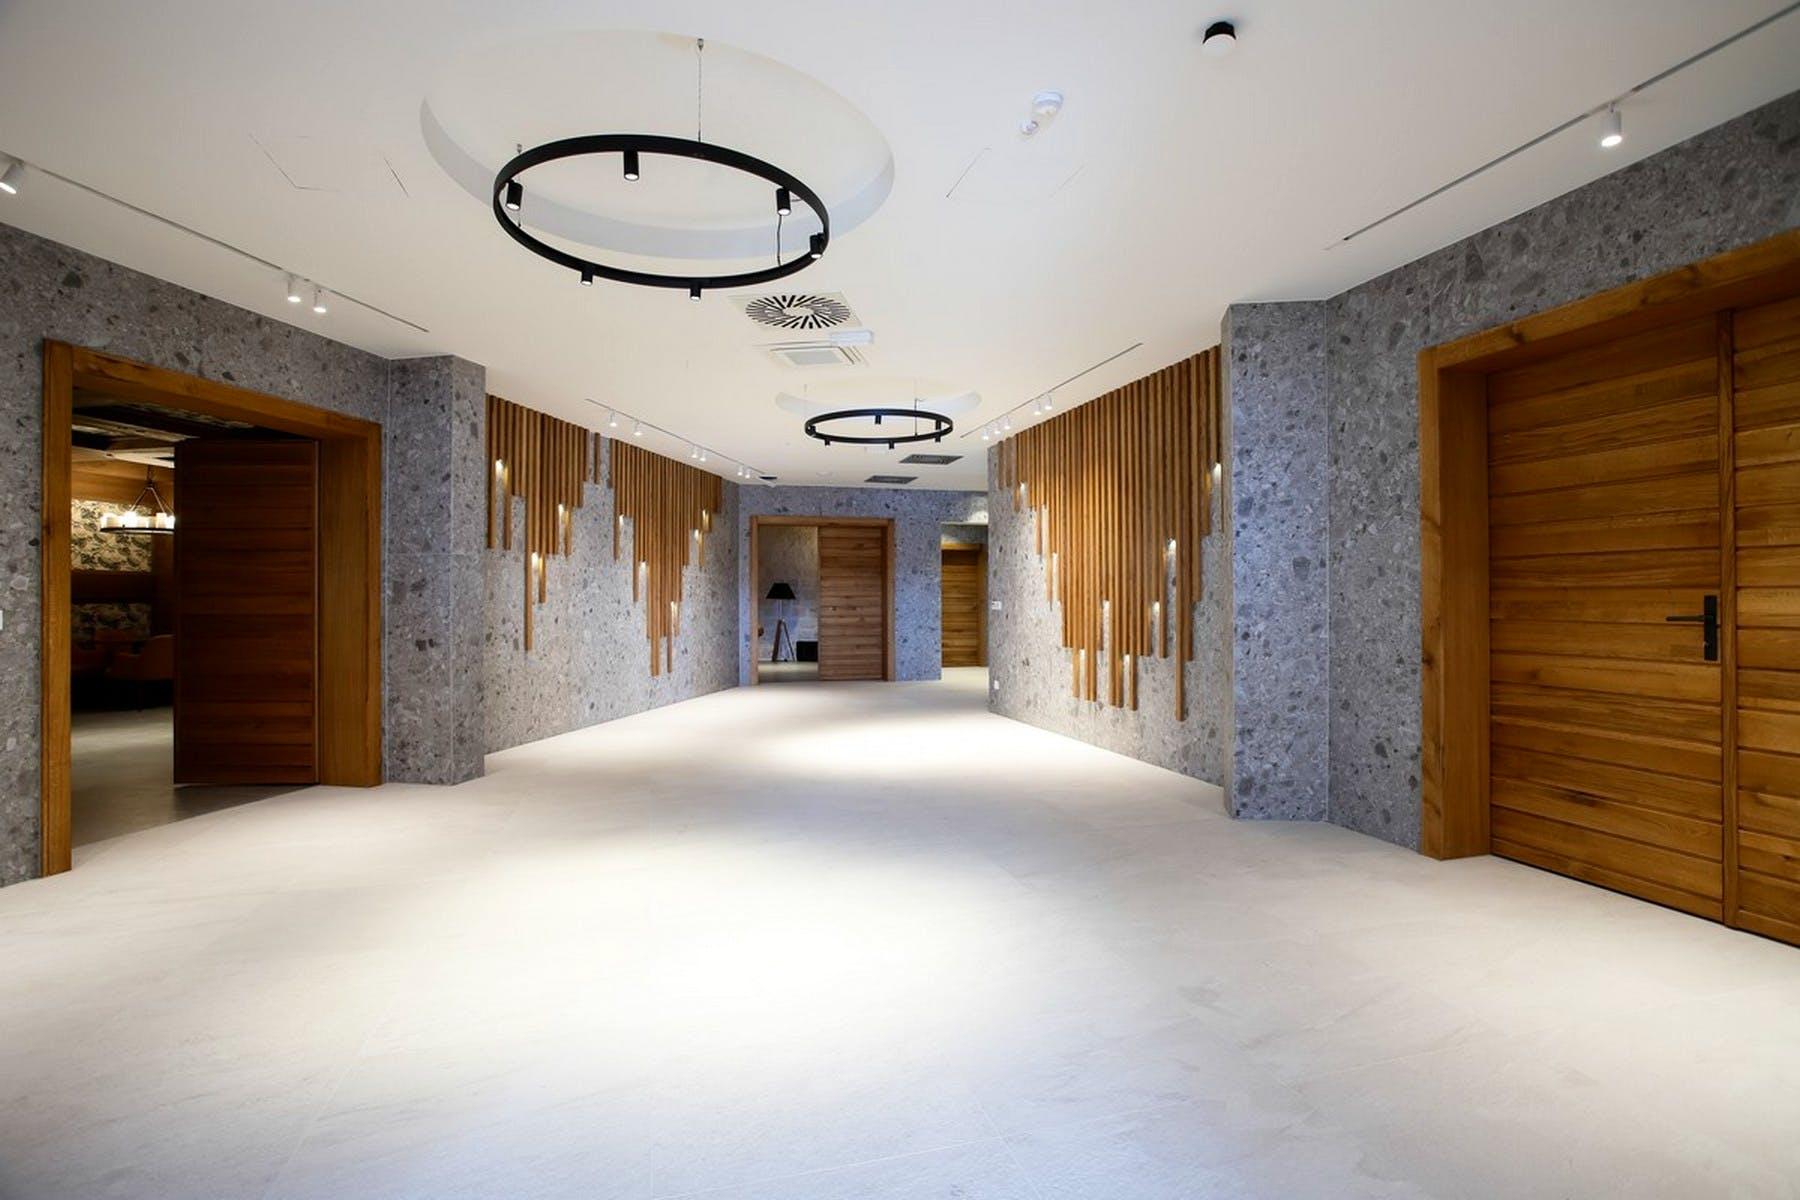 Luxurious halls